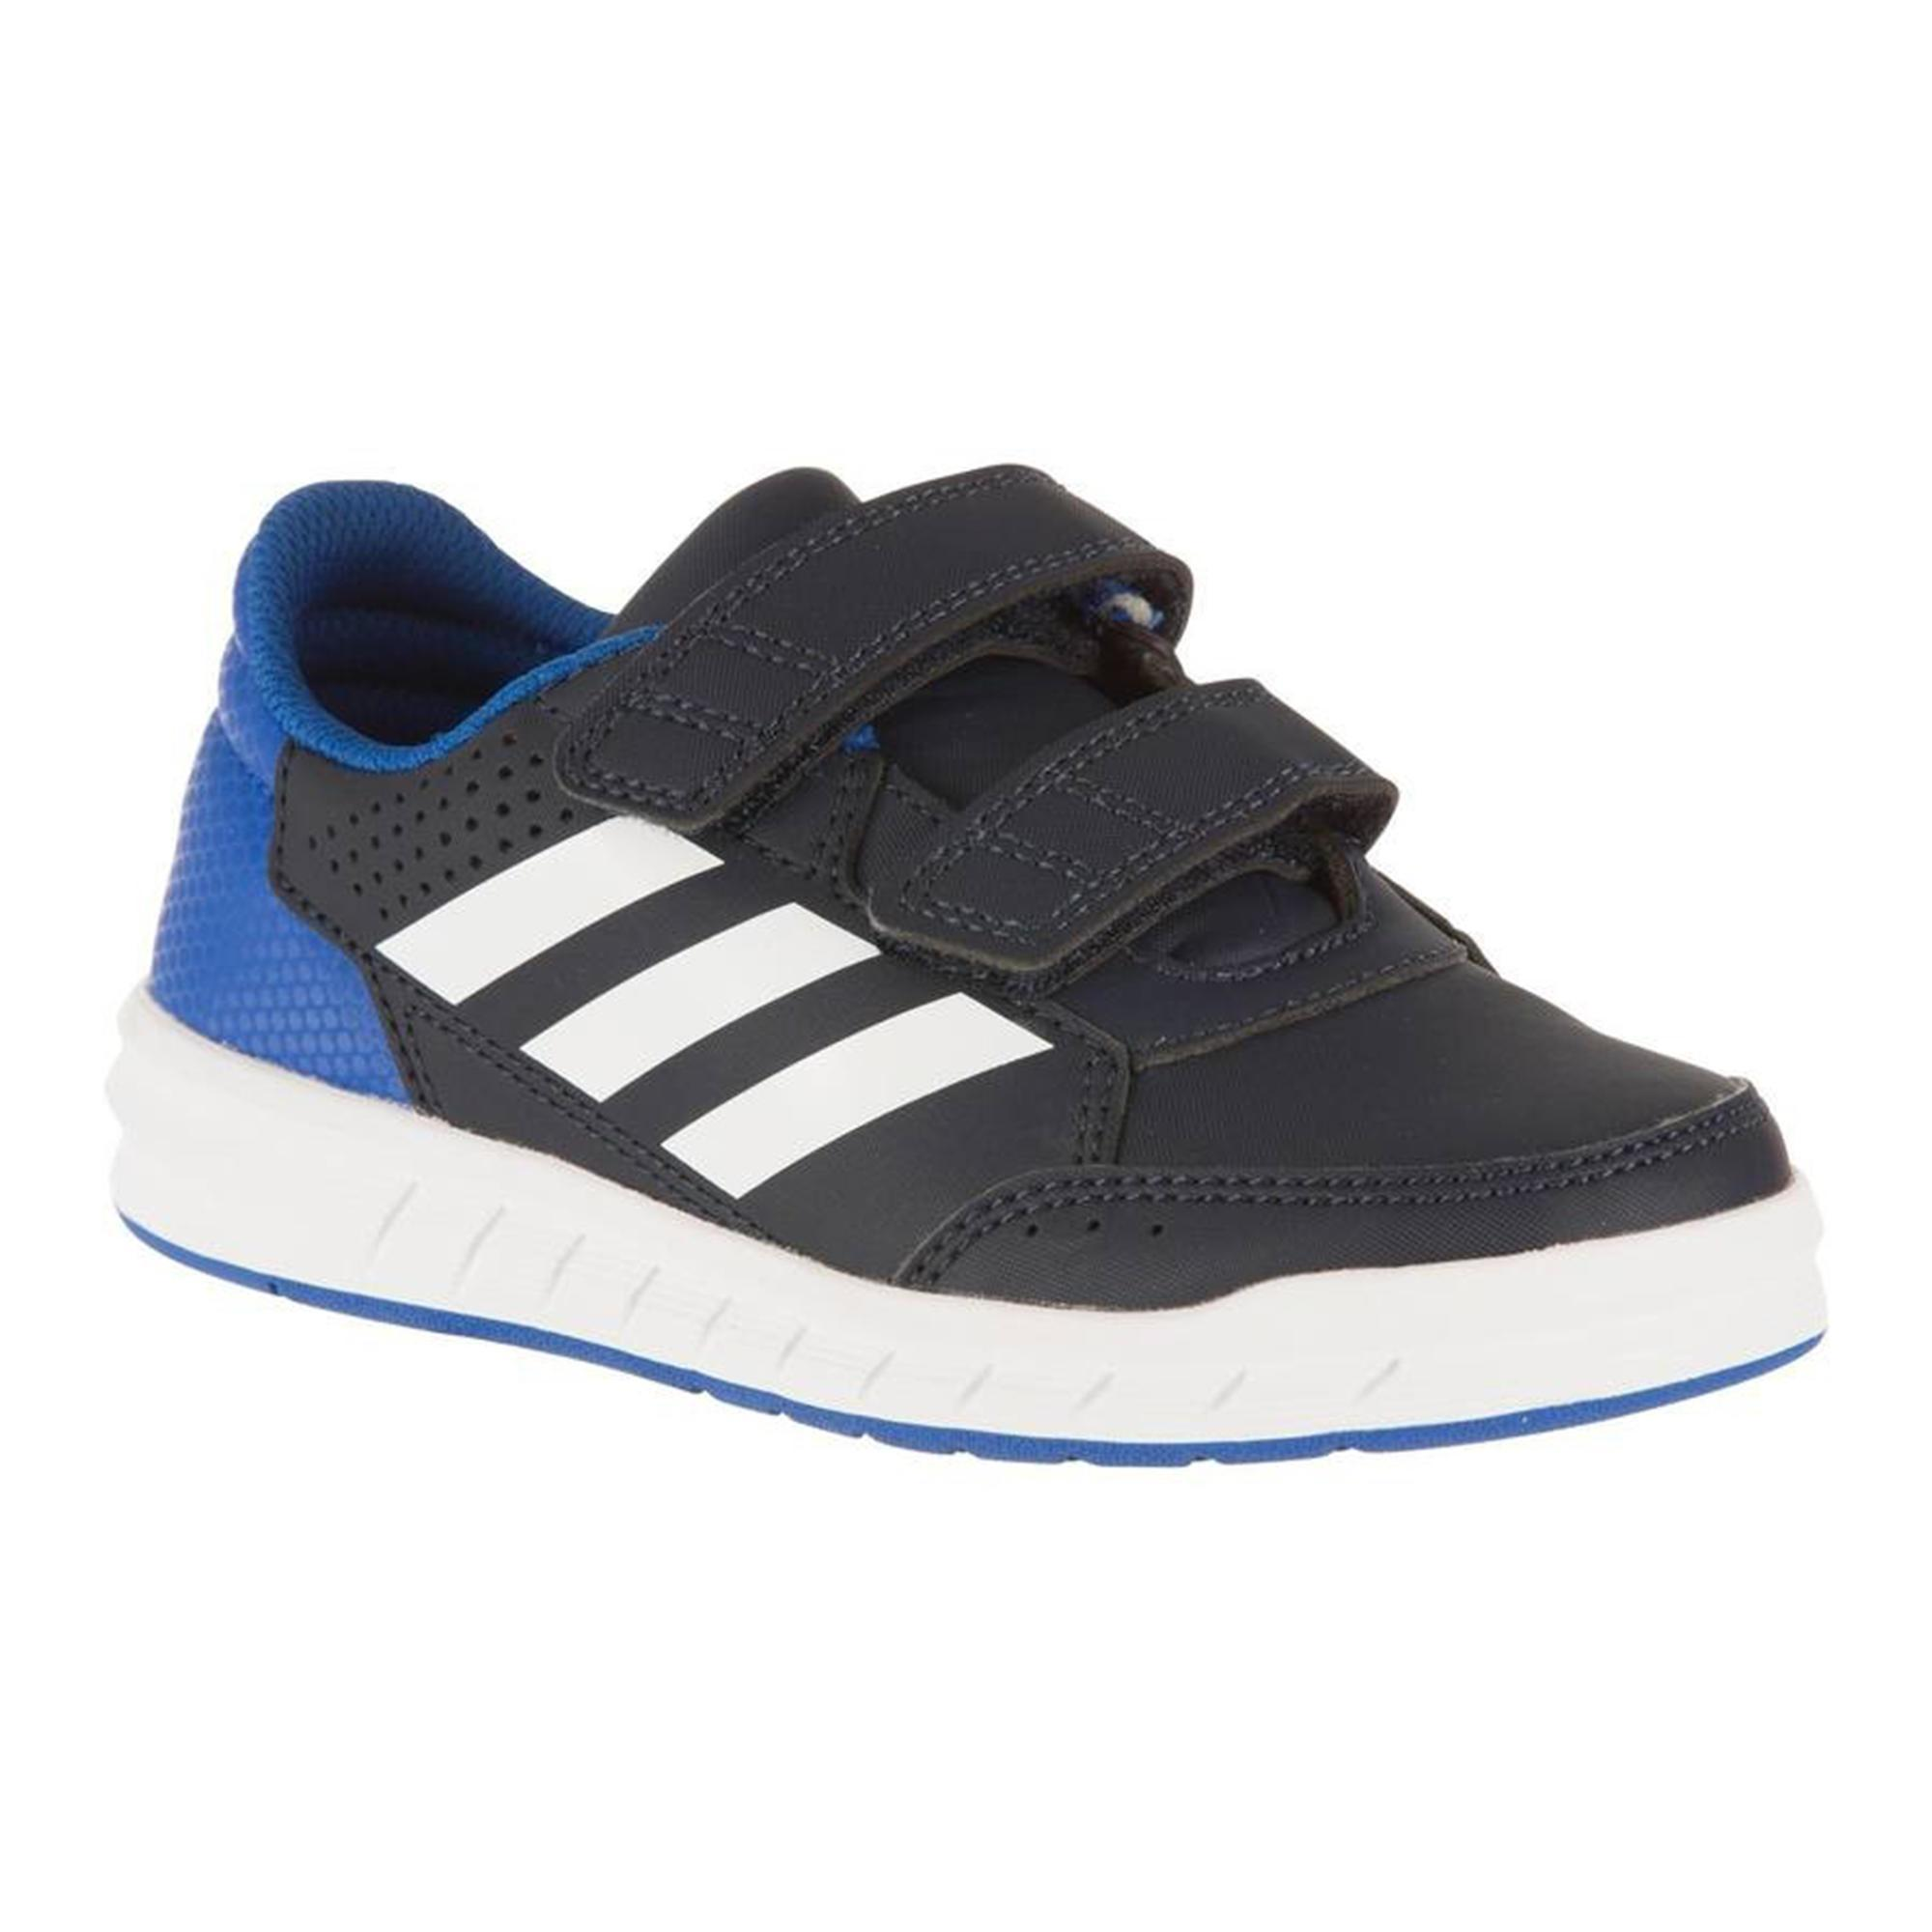 Chaussures de tennis enfant adidas altasport bleu adidas